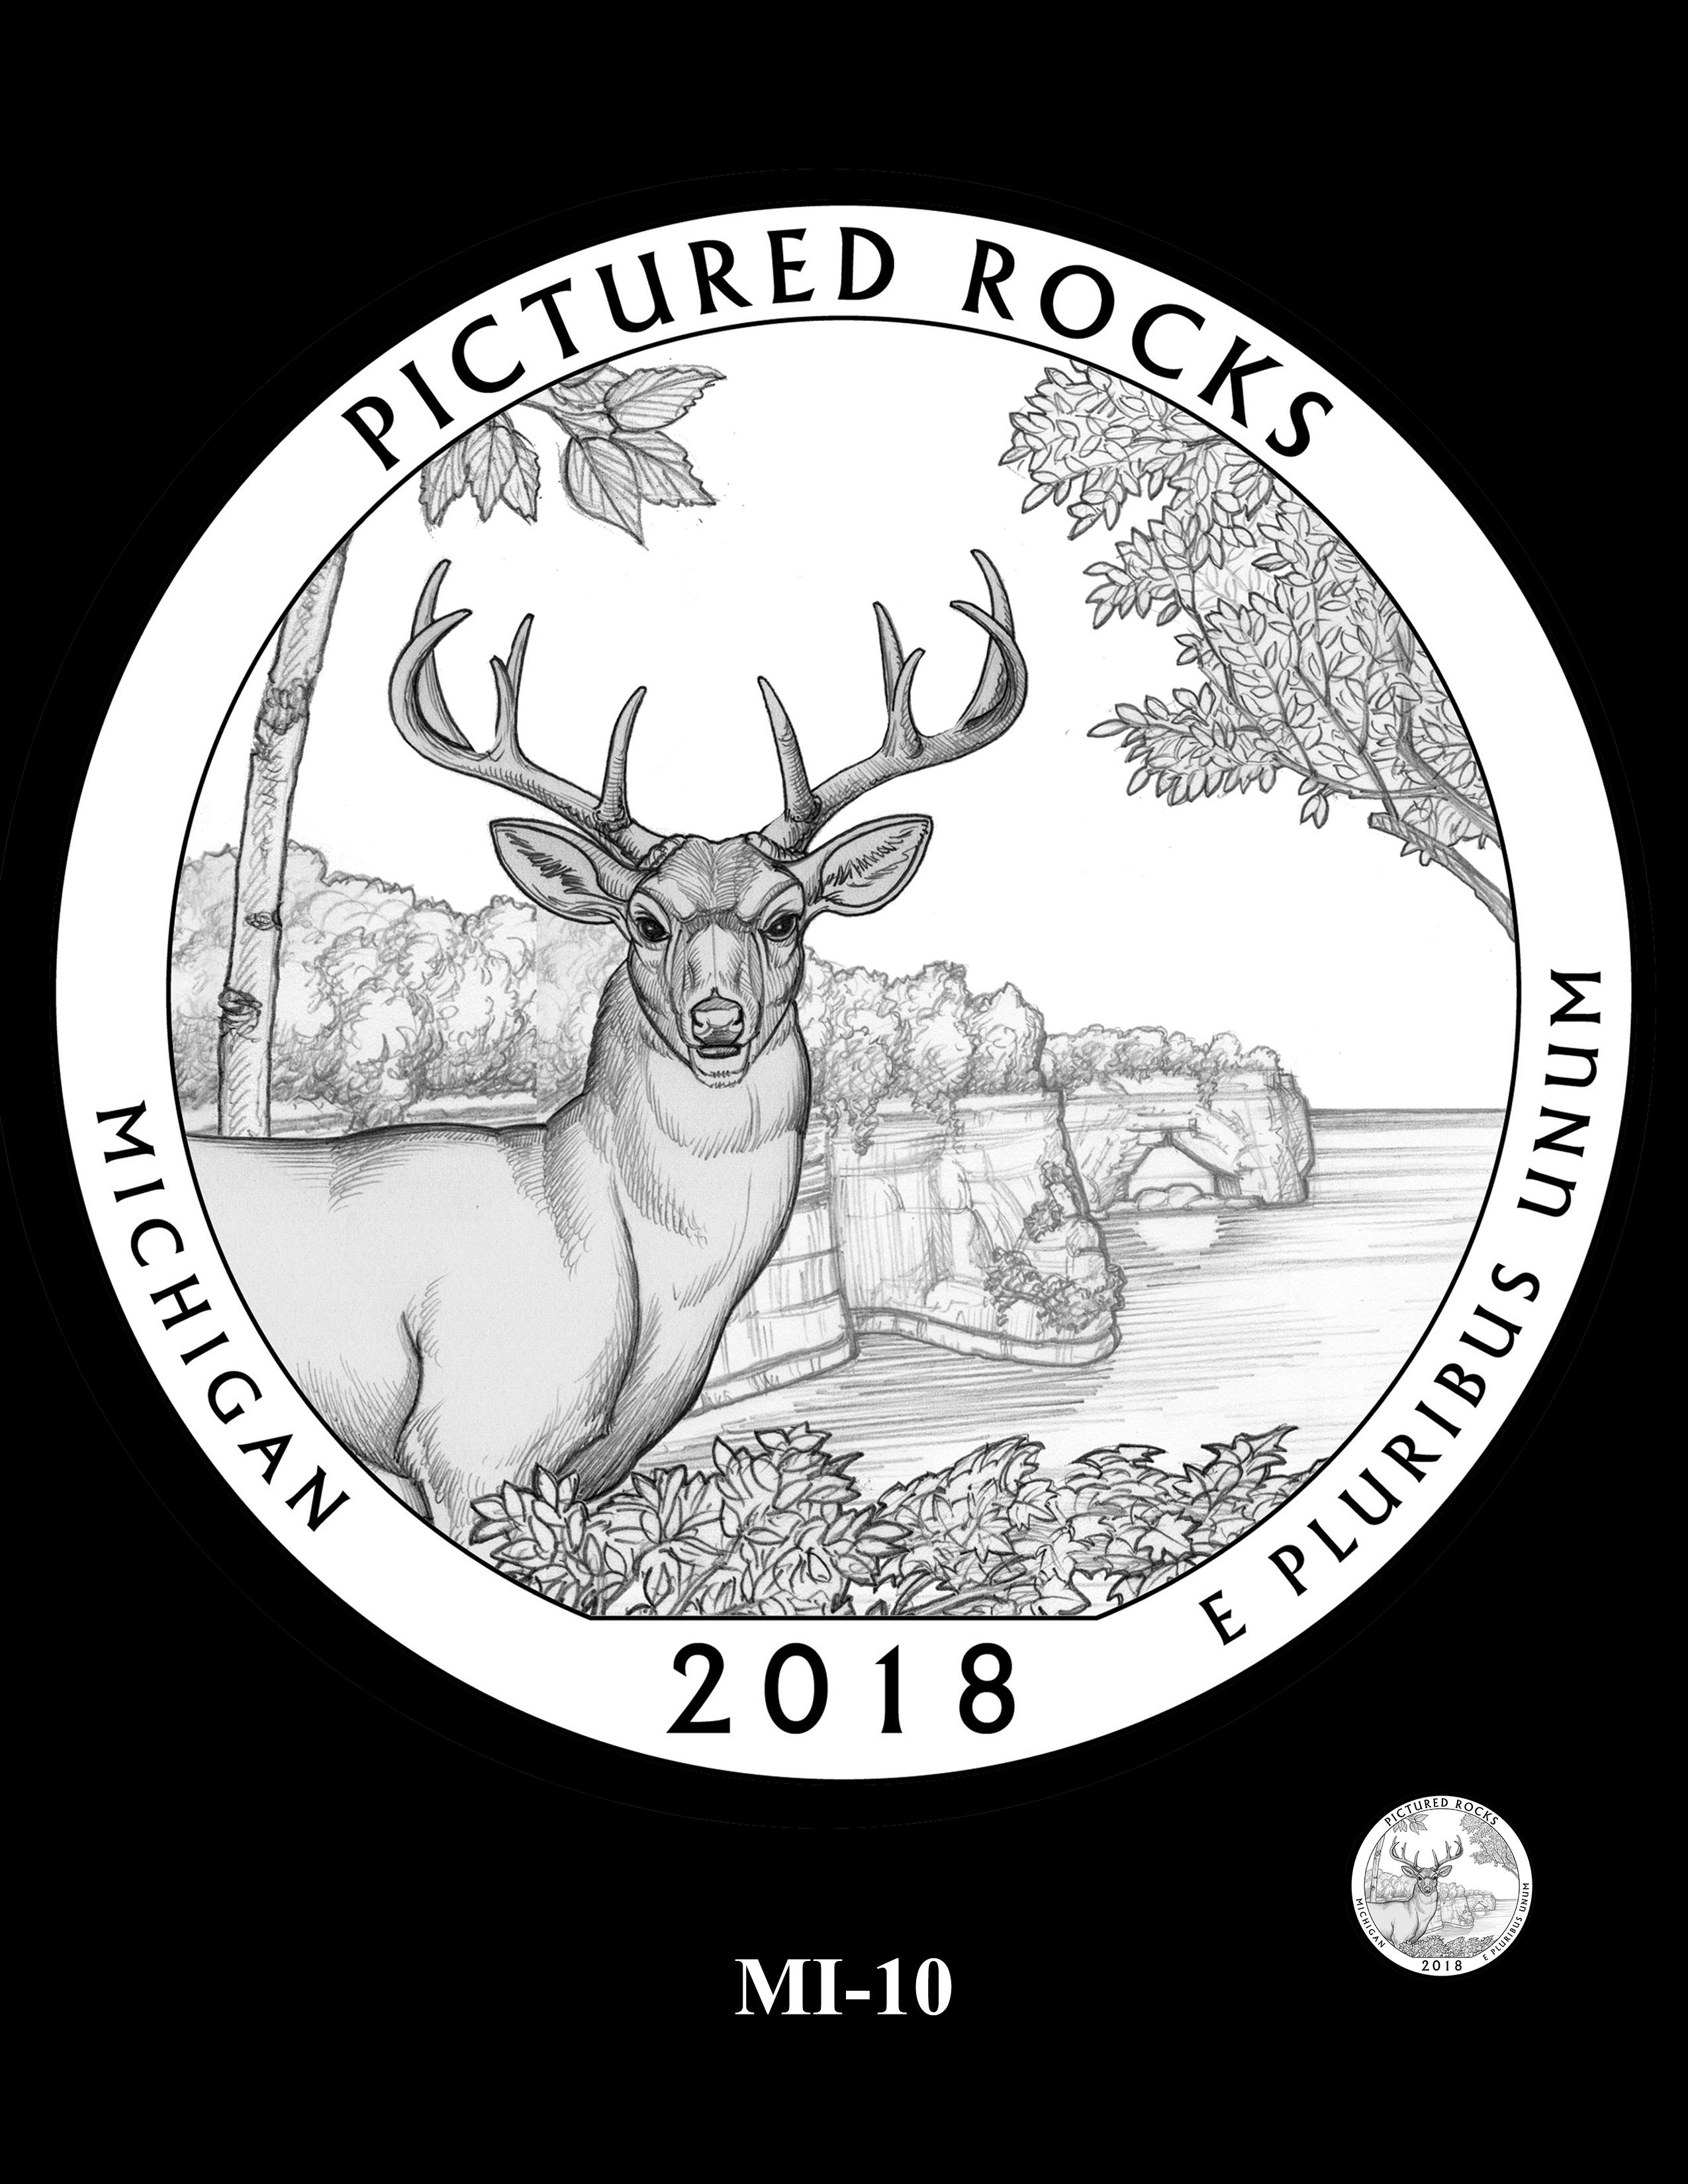 MI-10 -- 2018 America the Beautiful® Quarters Program